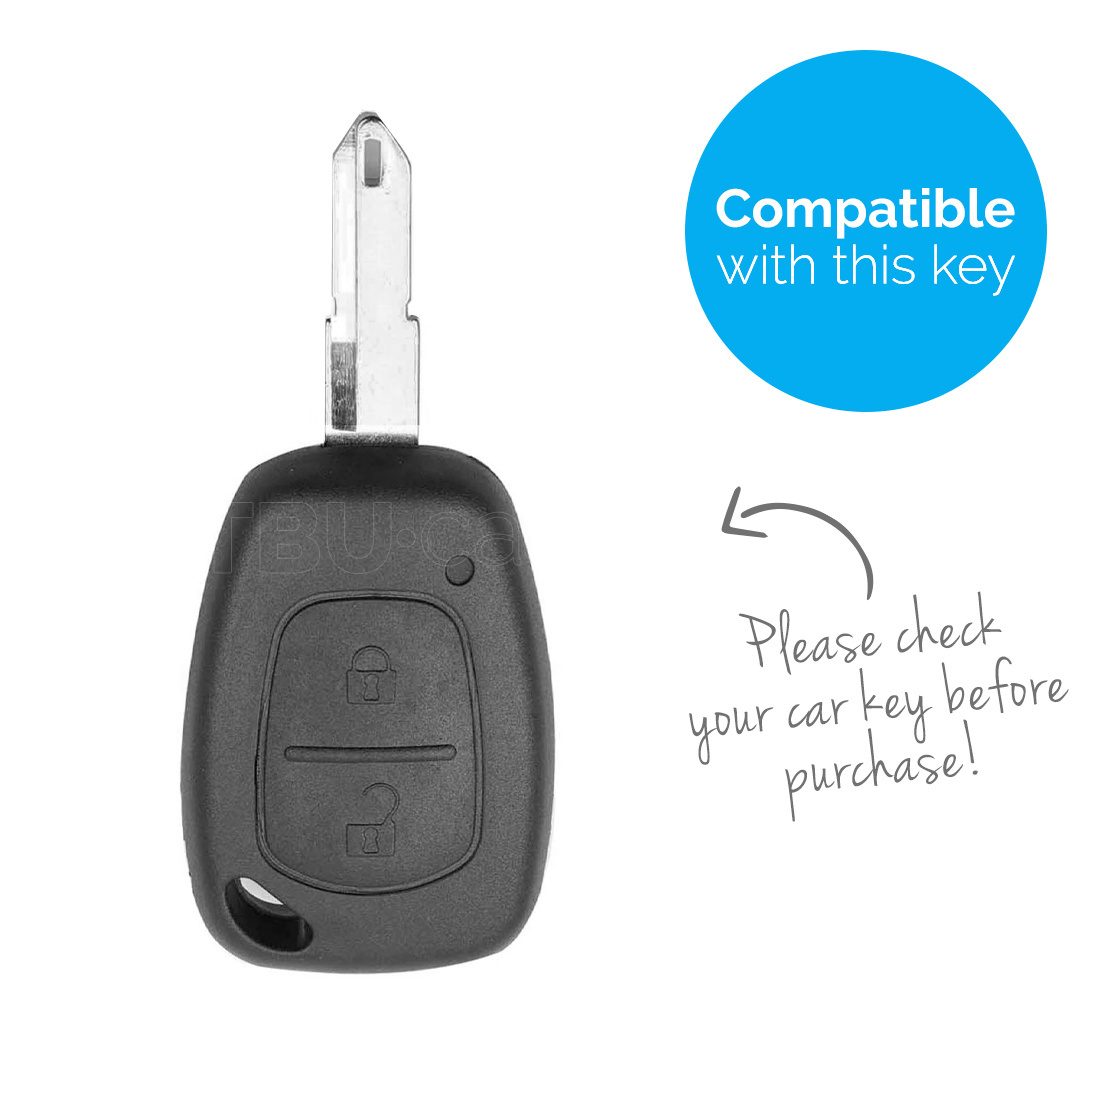 TBU car Autoschlüssel Hülle für Nissan 2 Tasten - Schutzhülle aus Silikon - Auto Schlüsselhülle Cover in Hellblau